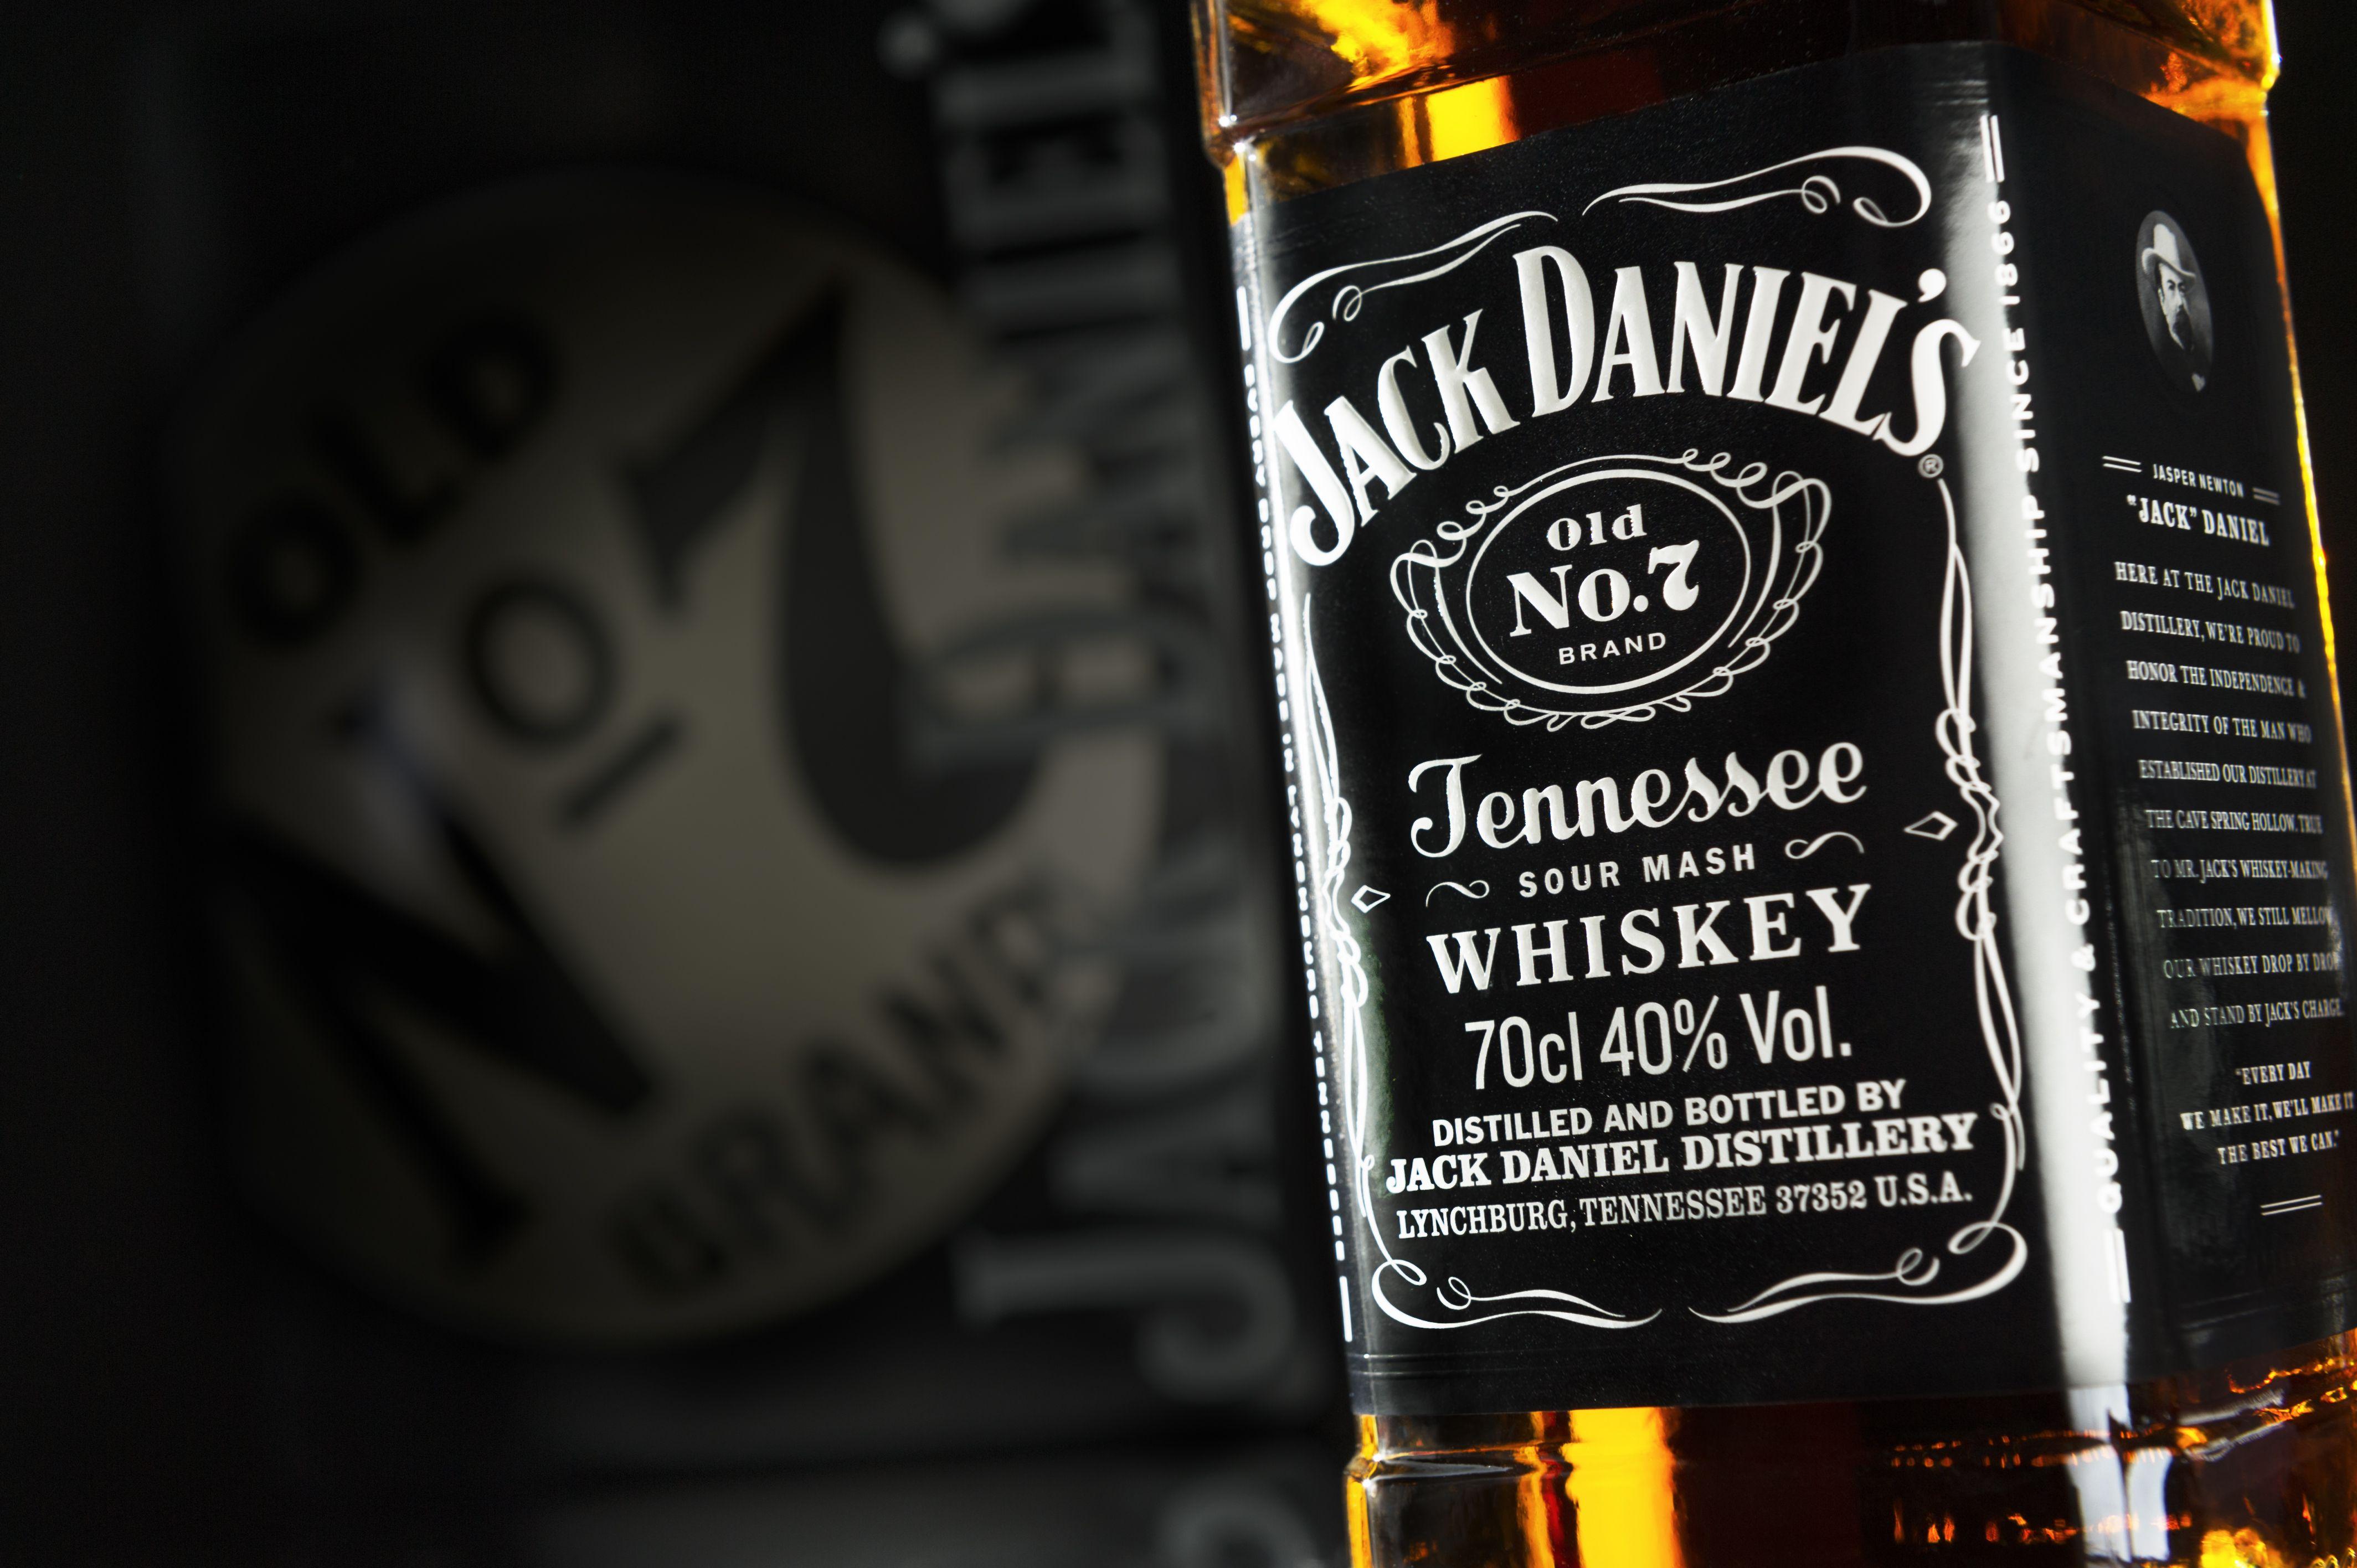 Jack Daniels Hd Wallpaper For Desktop Pc And Mac Hd Wallpaper High Resolution Hd Wallpaper Top Quality Jack Daniels Jack Daniels Wallpaper Jack Daniels Drinks